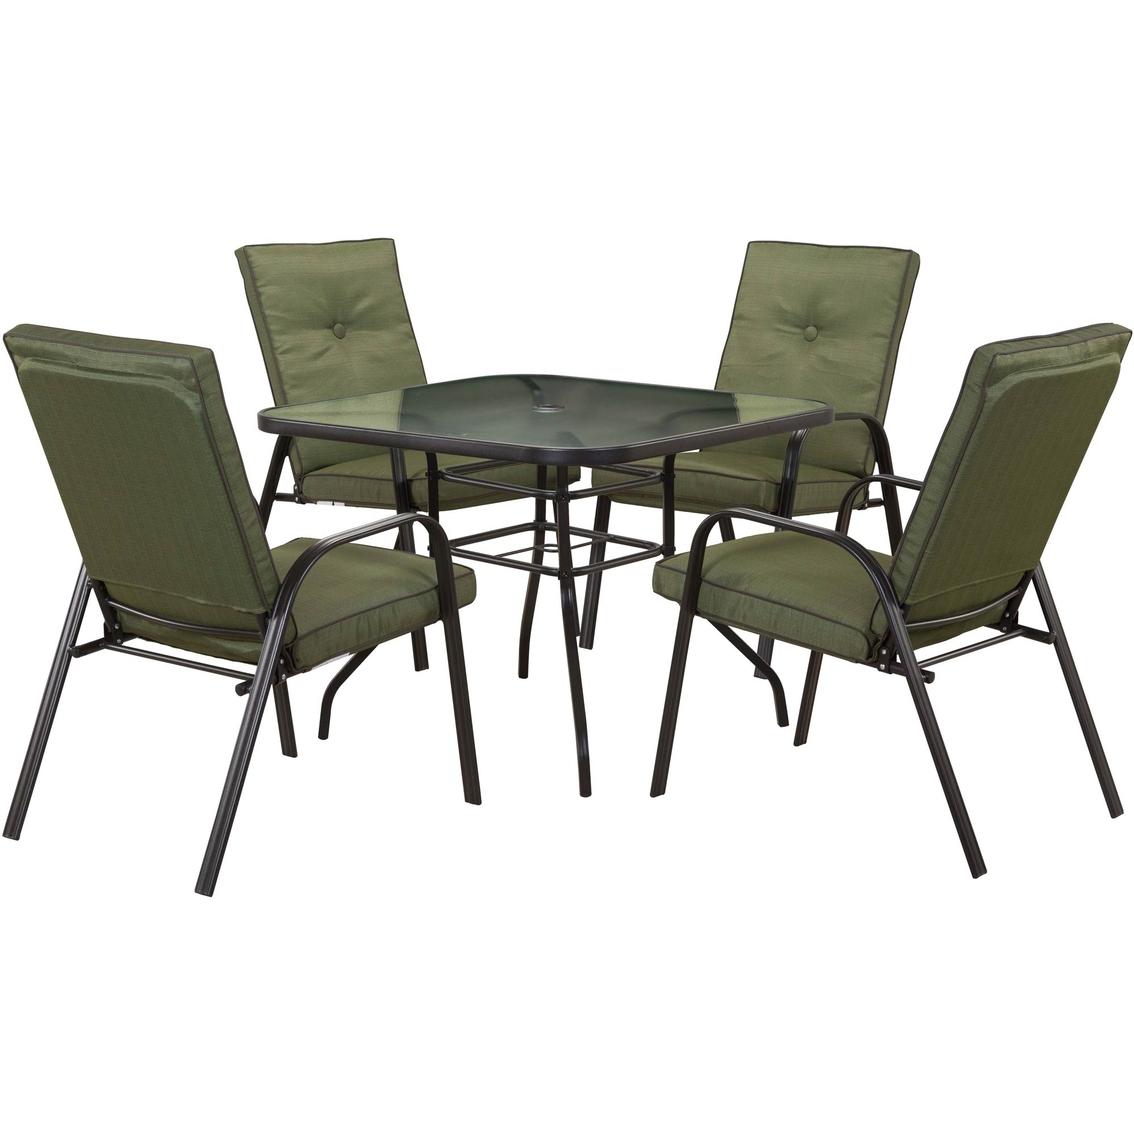 Courtyard Creations Ashridge 5 Pc Cushion Dining Set